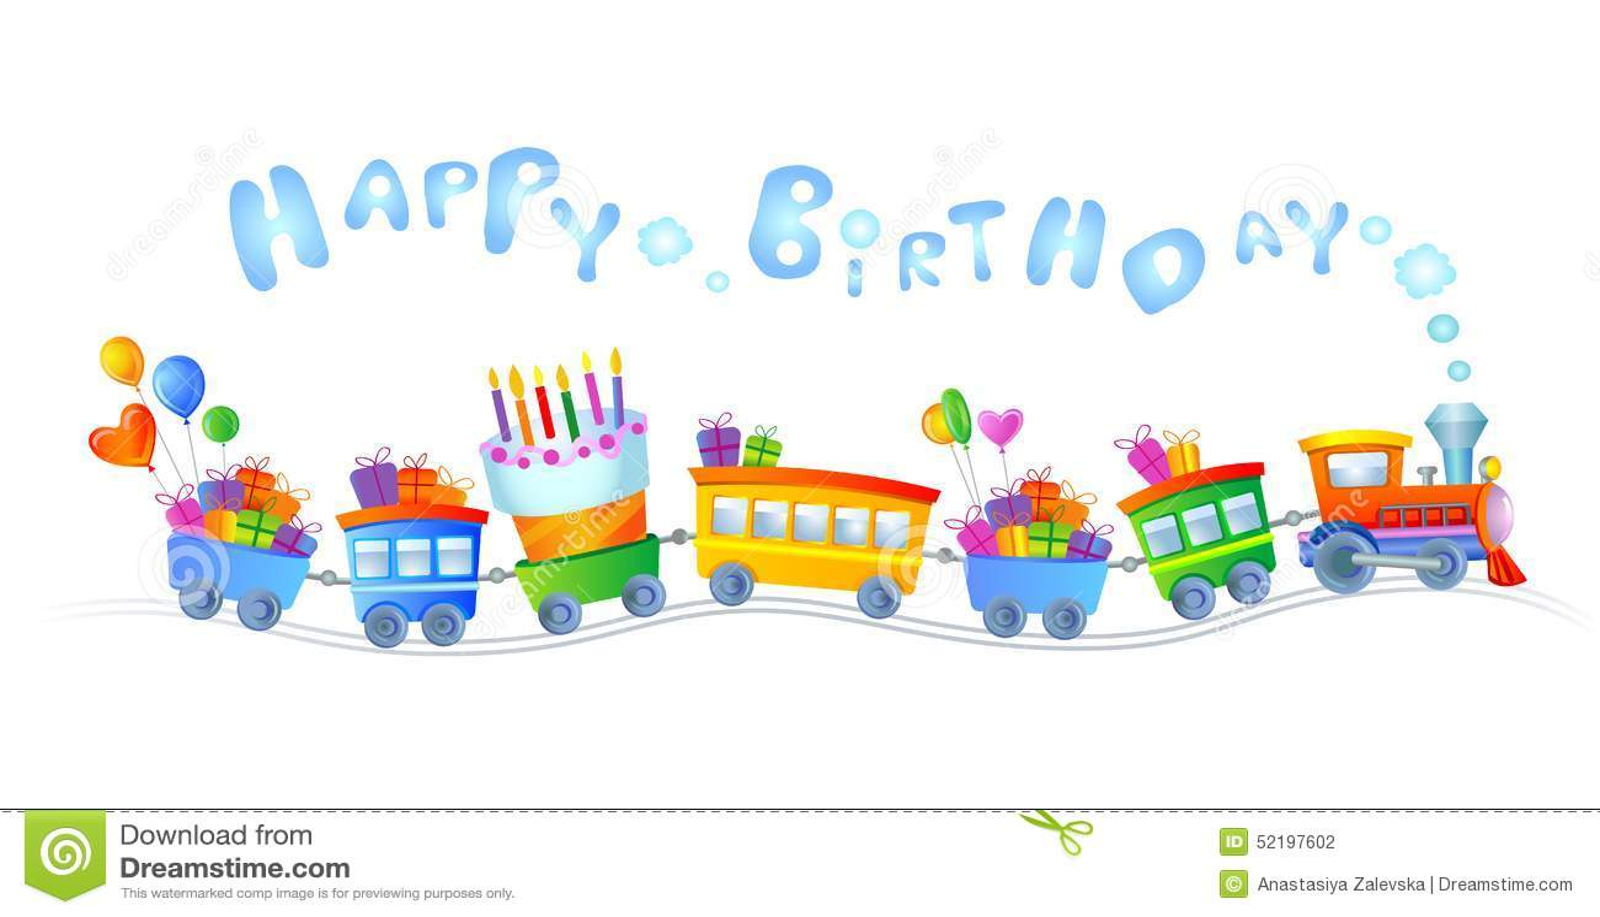 Happy Birthday Train Stock Vector Illustration Of Design 52197602